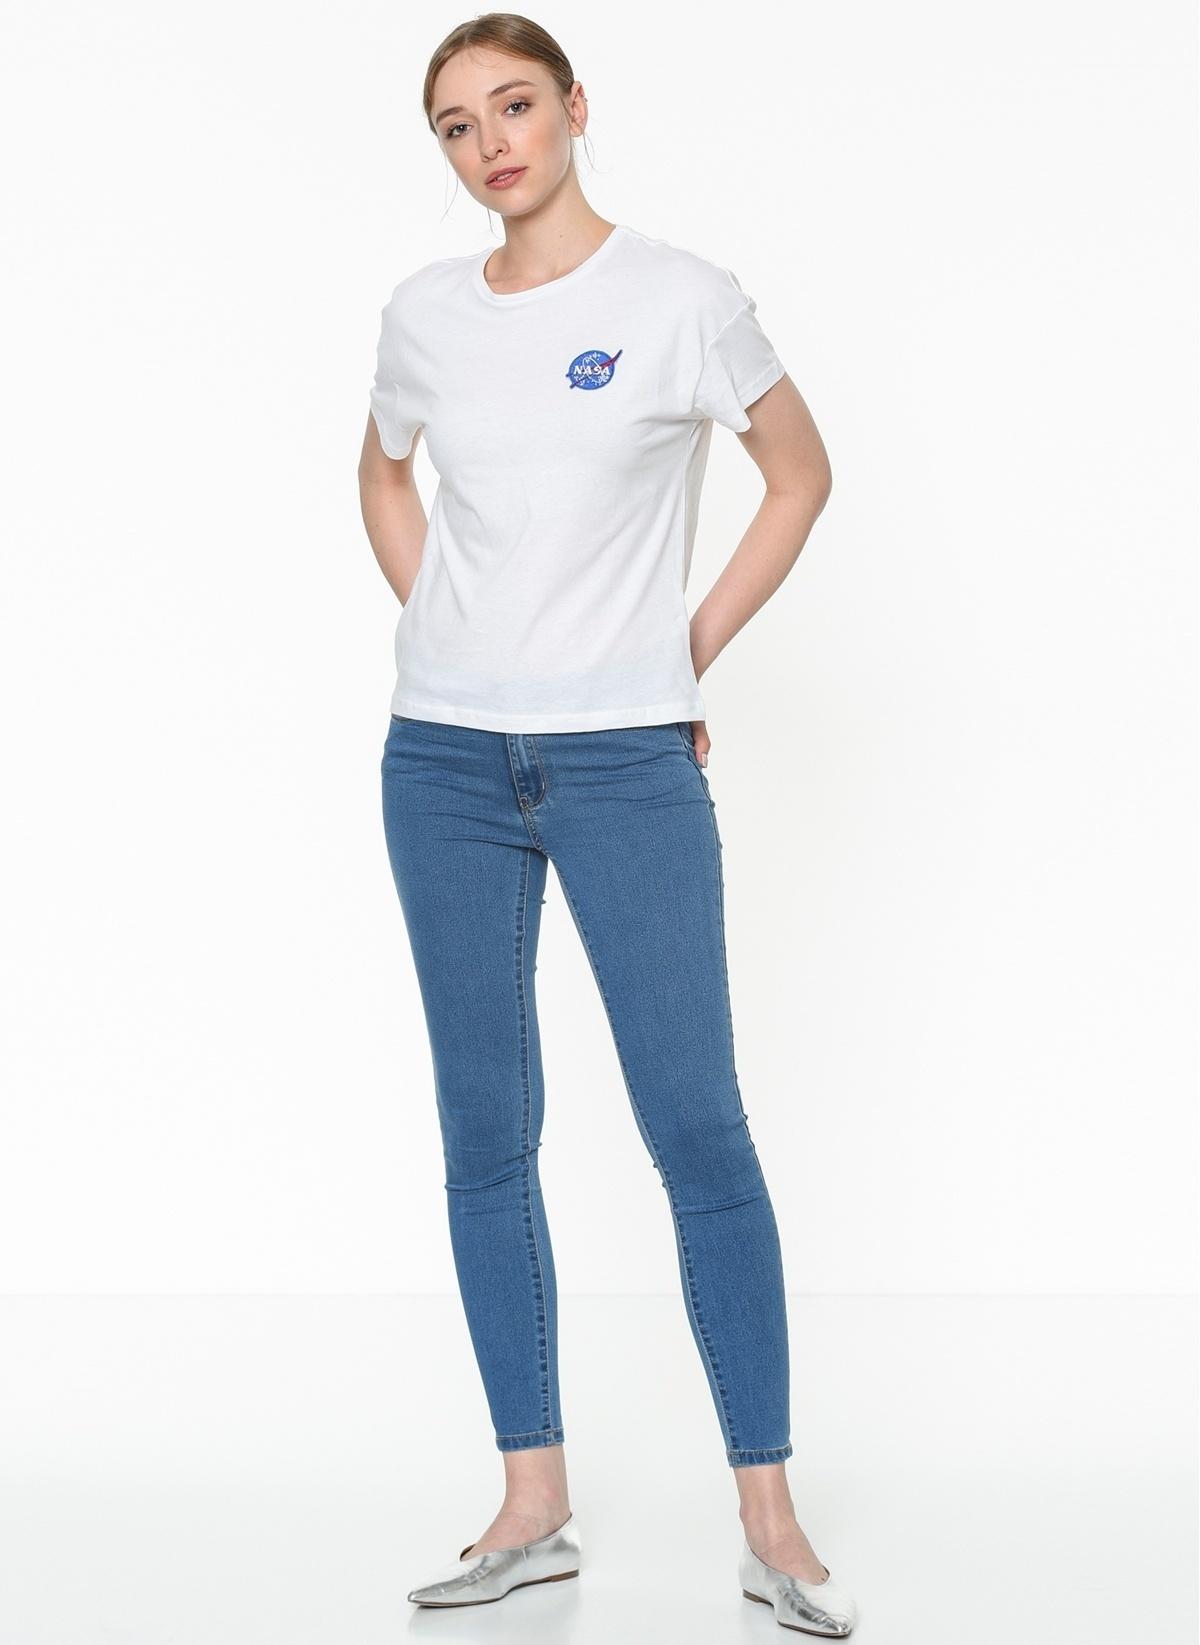 Vero Moda Jean Pantolon | Julia – Slim 10203146-vmjulia Flex İt Mr Slim Jegging – 59.9 TL